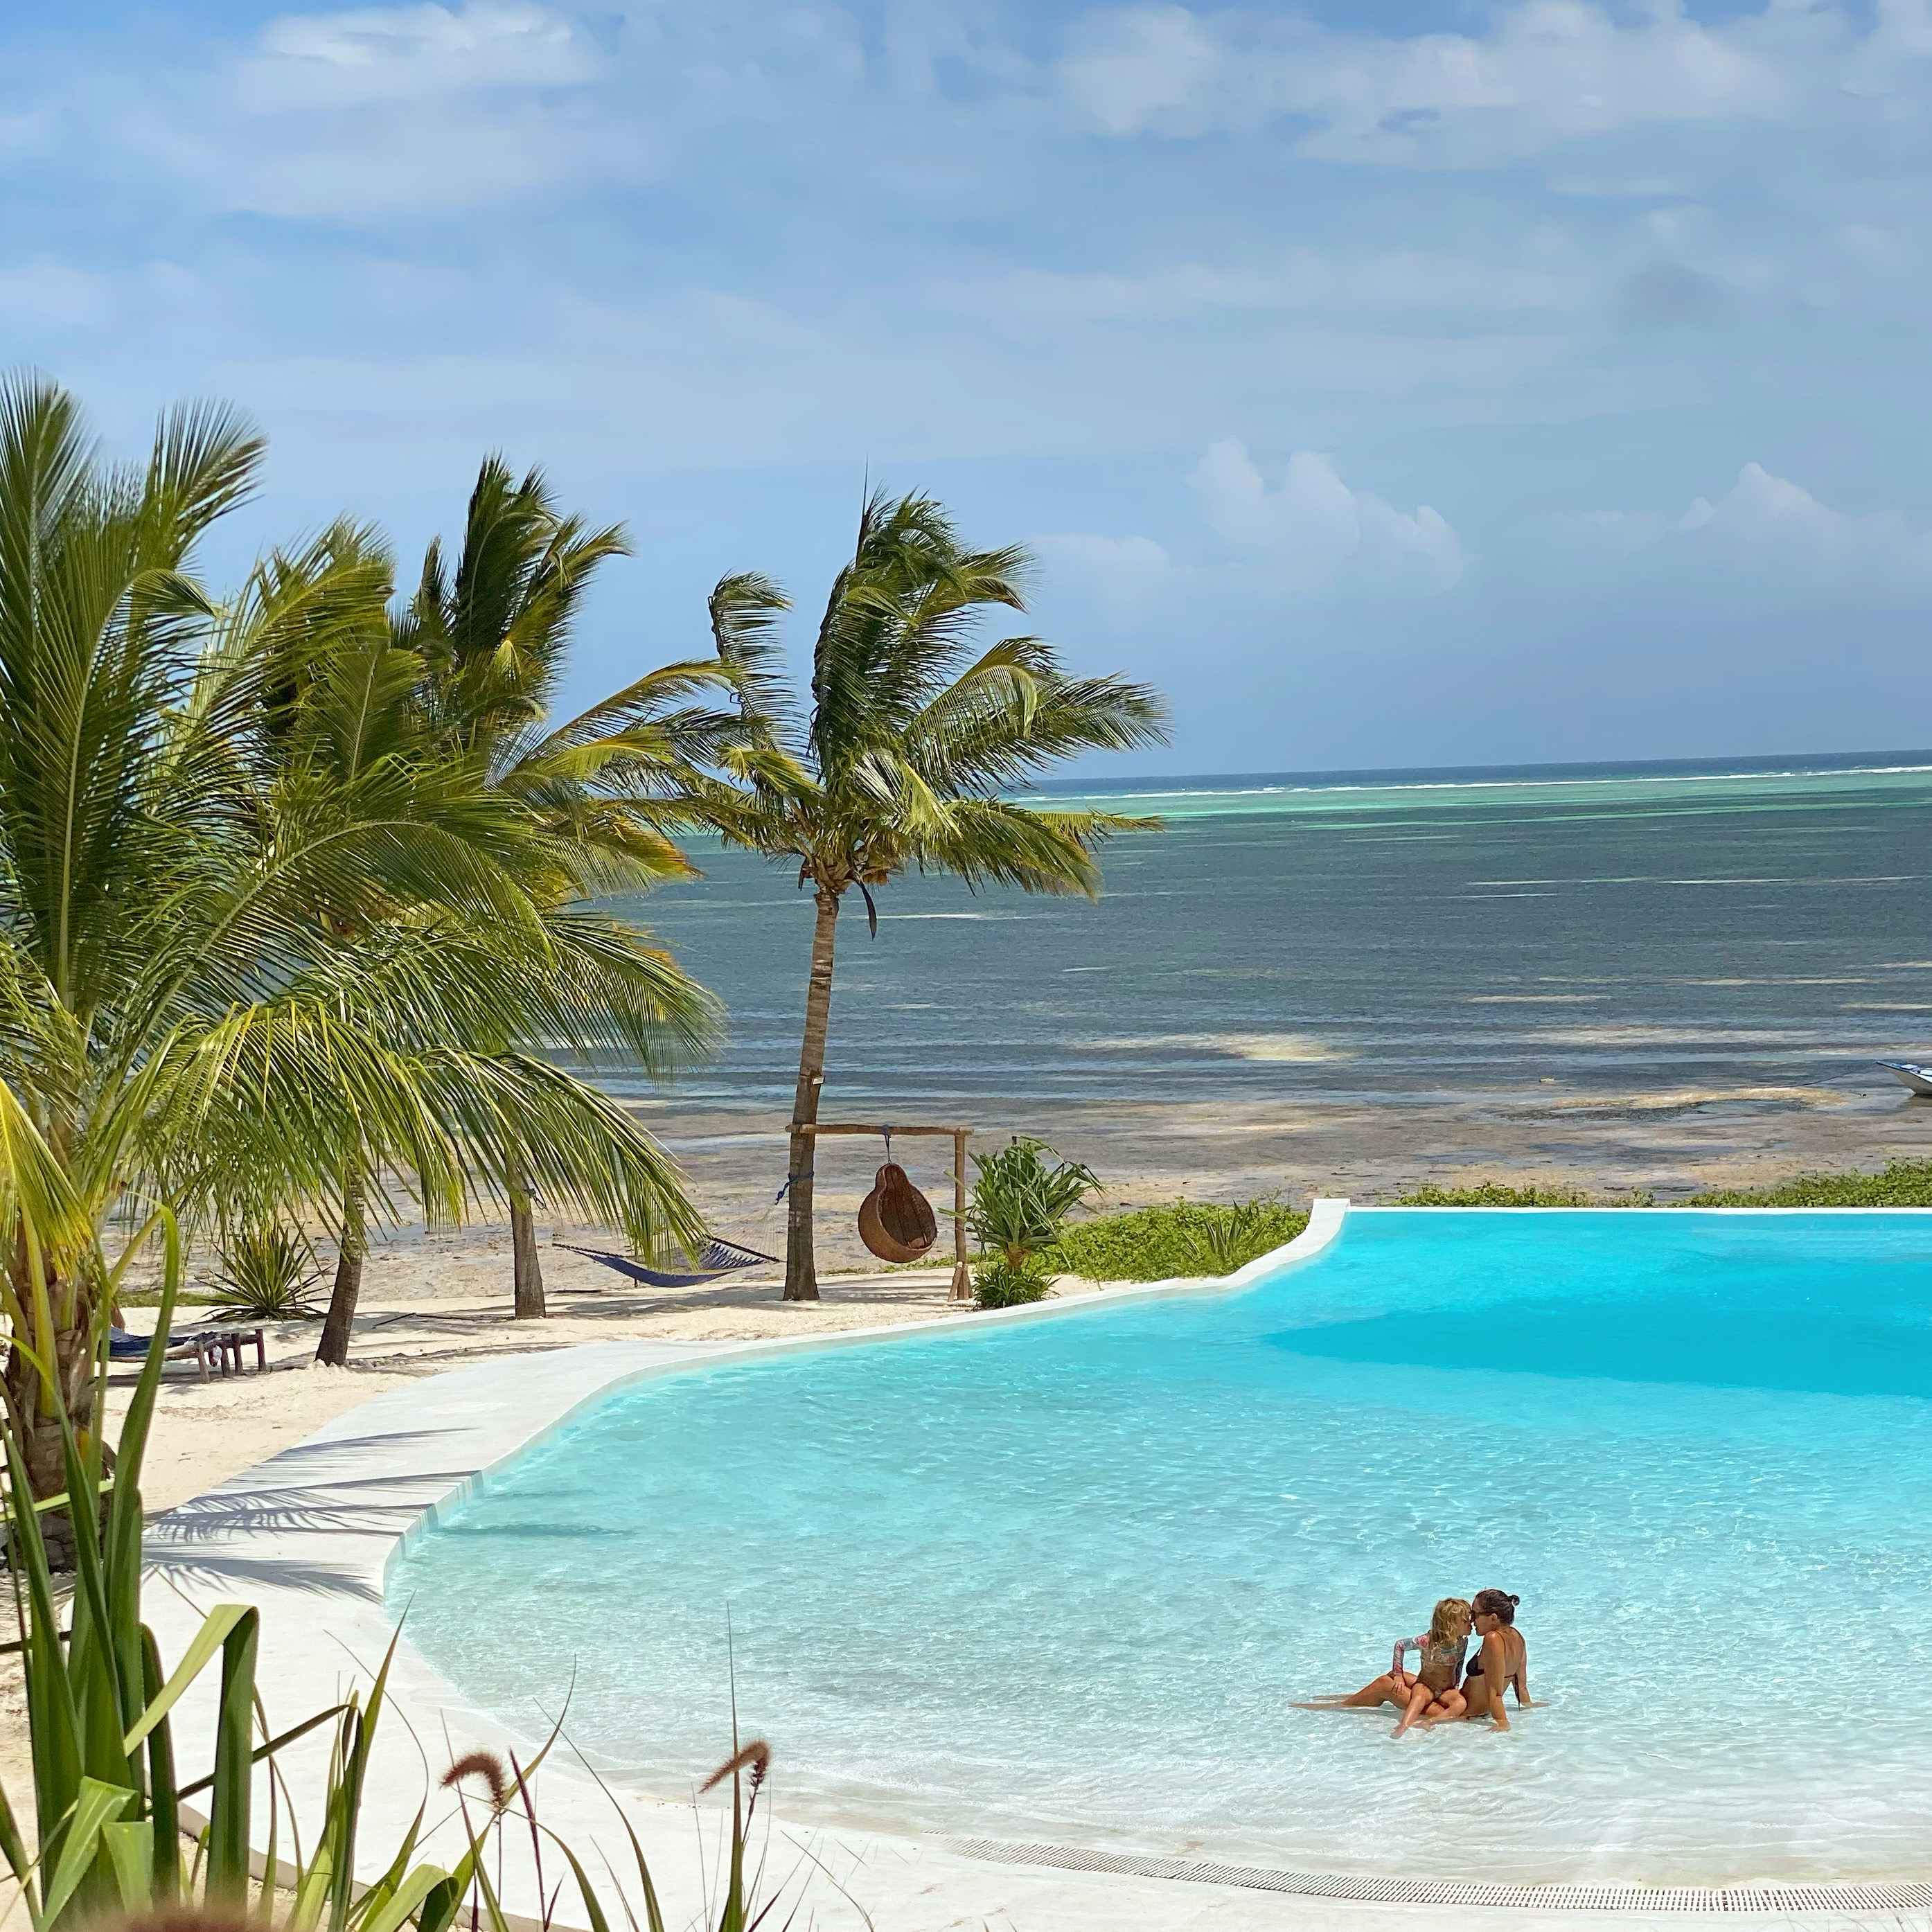 onde ficar zanzibar - dormir em zanzibar - melhores hotéis de Zanzibar